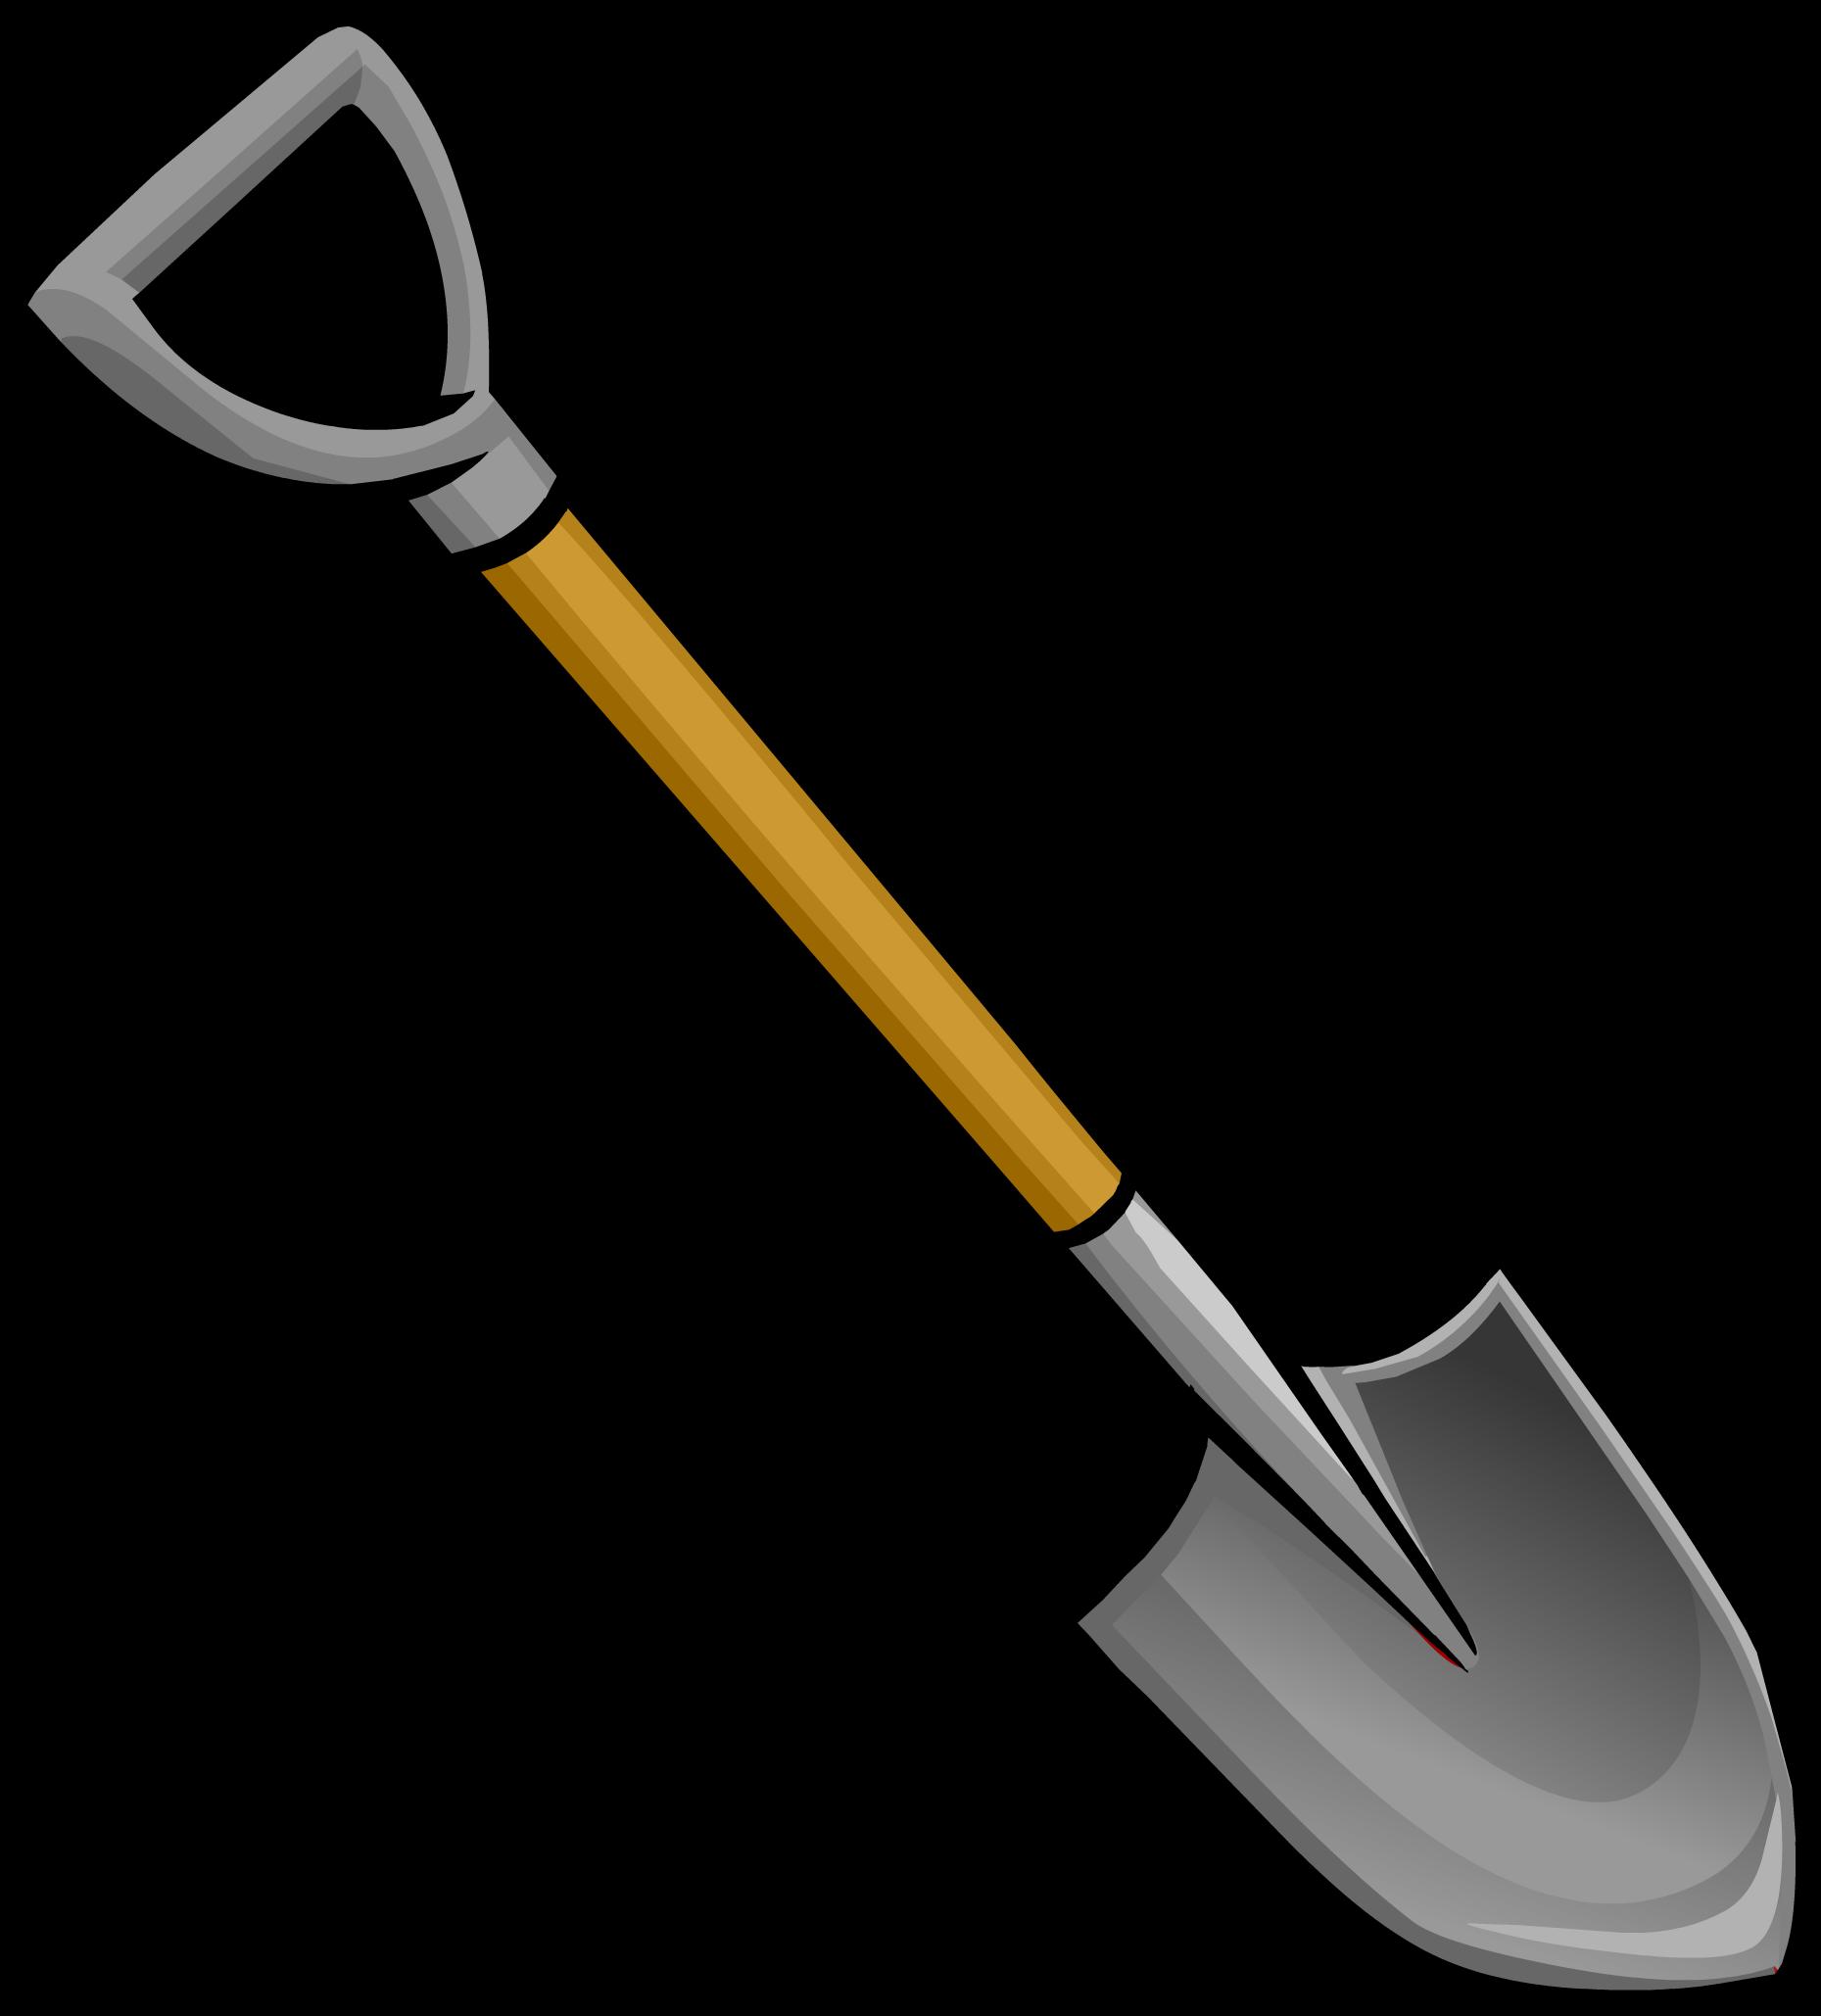 Cartoon Shovel Related Keywords & Suggestions - Cartoon Shovel Long ...